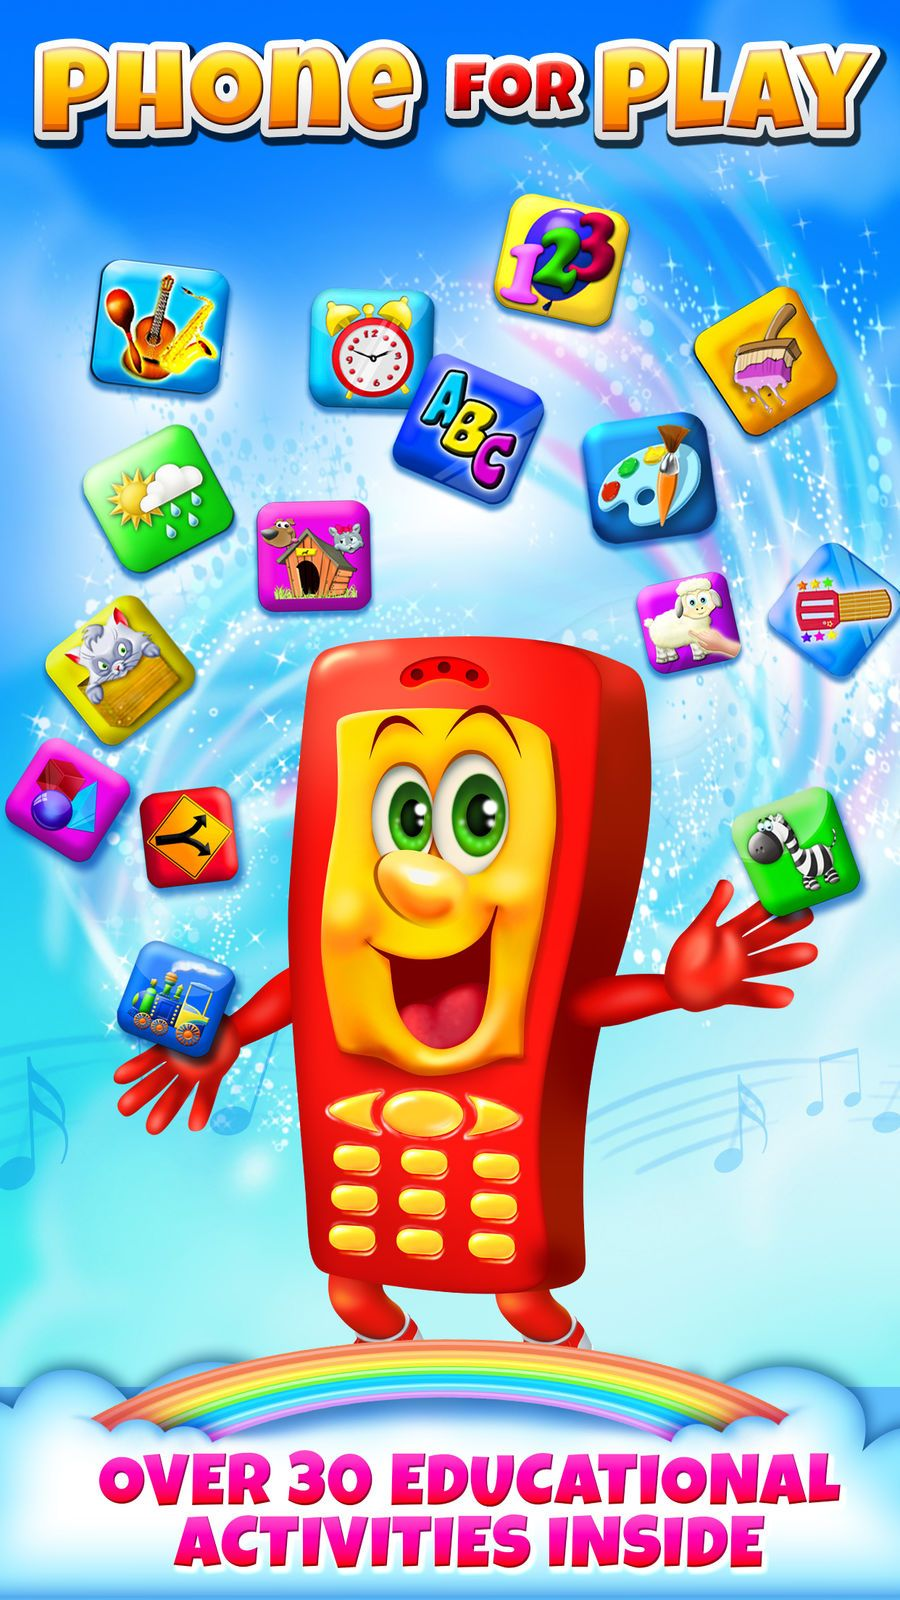 Phone for Play Creative Fun GamesEducationRoleFamily